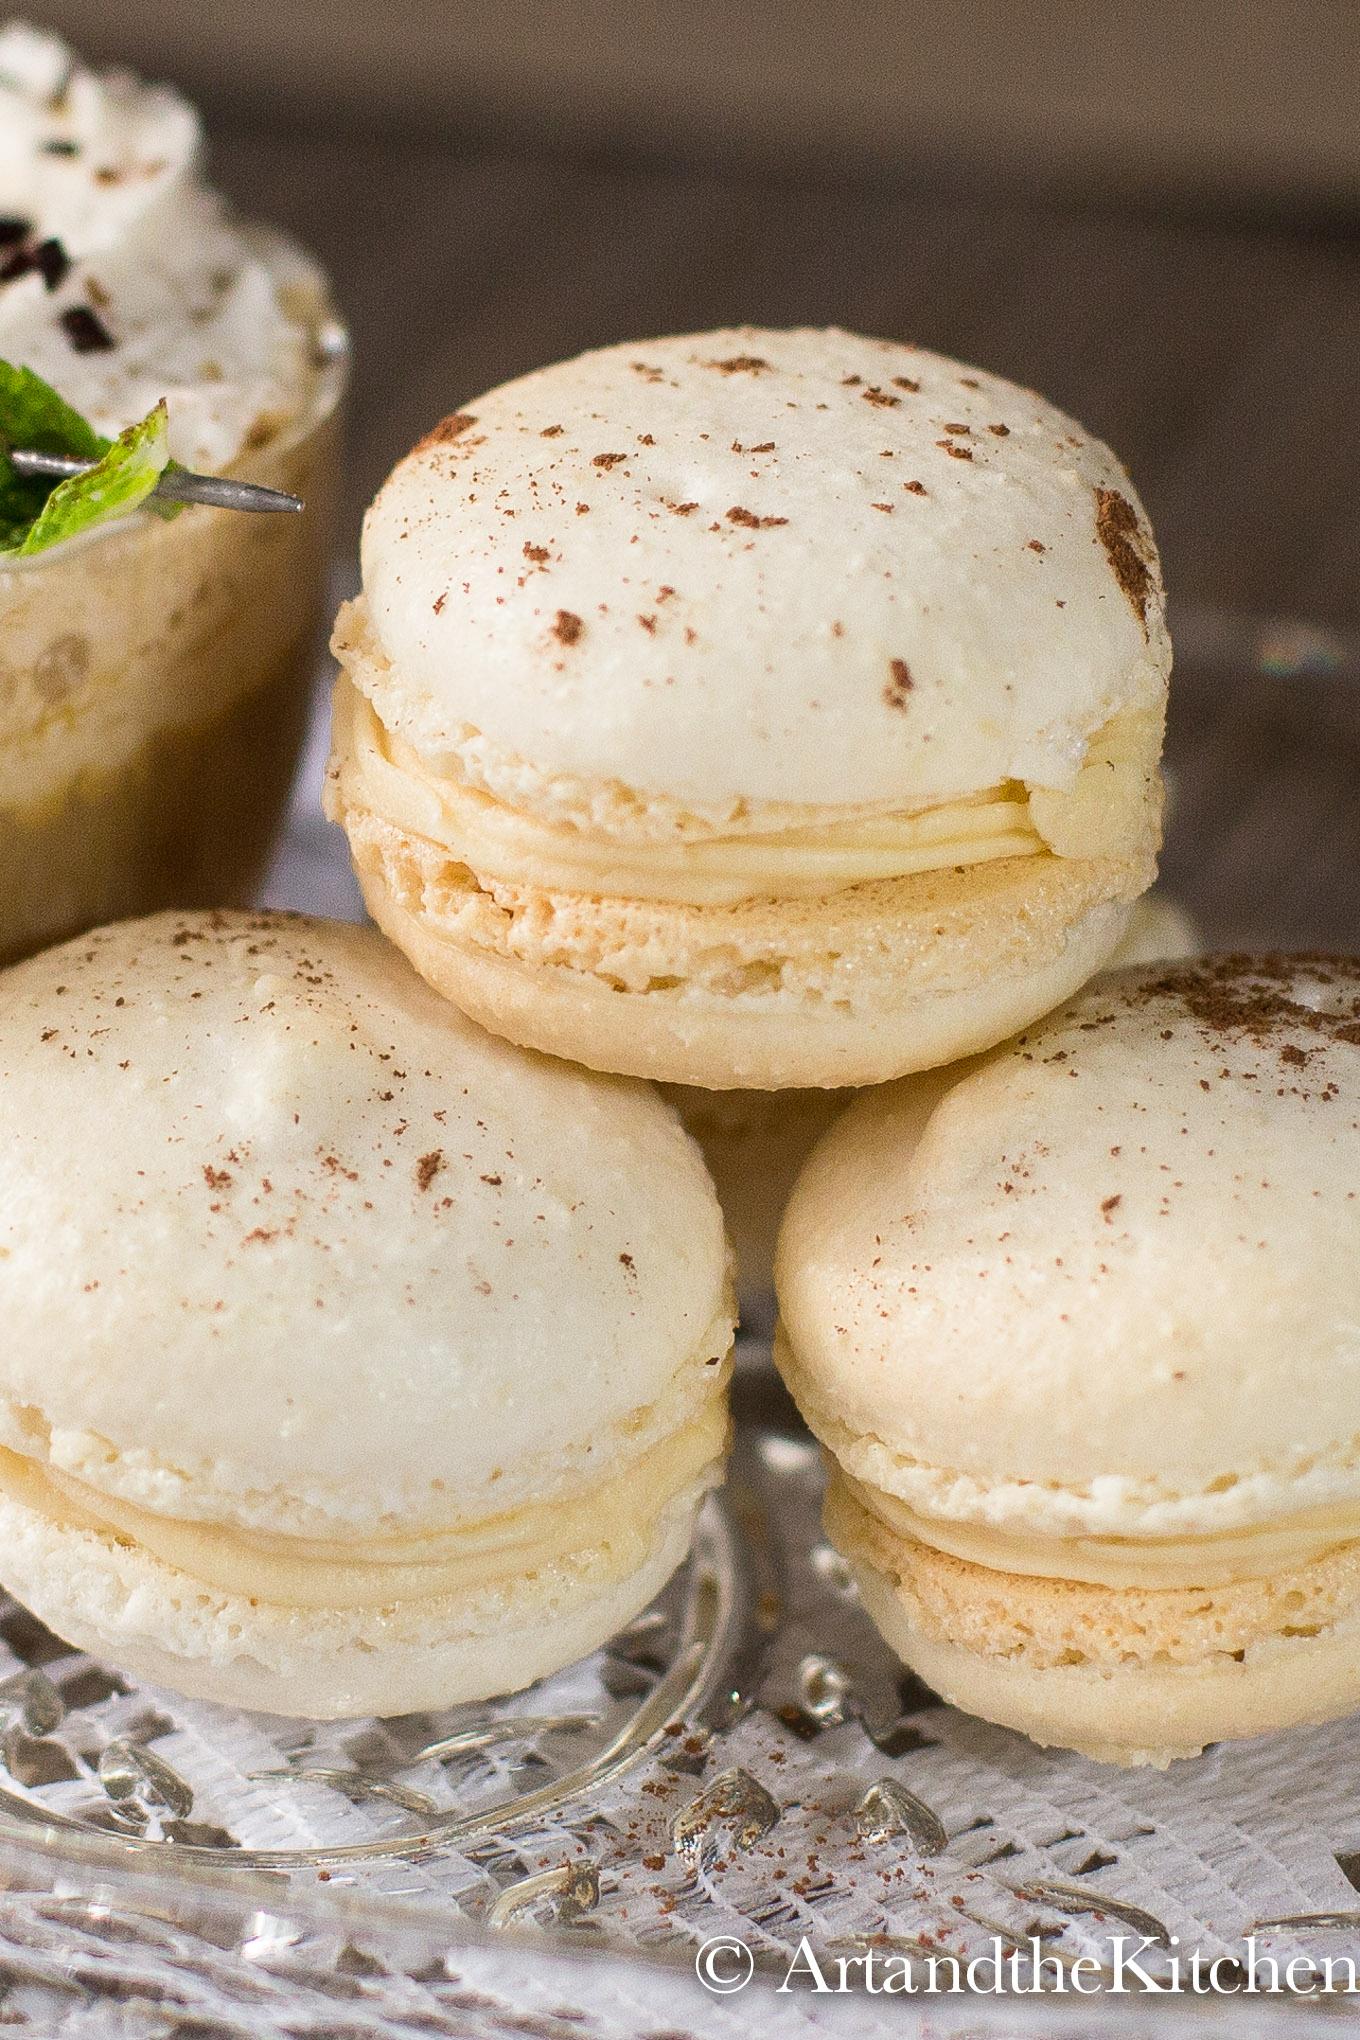 Stack of three Irish cream filled macaron cookies on glass plate.